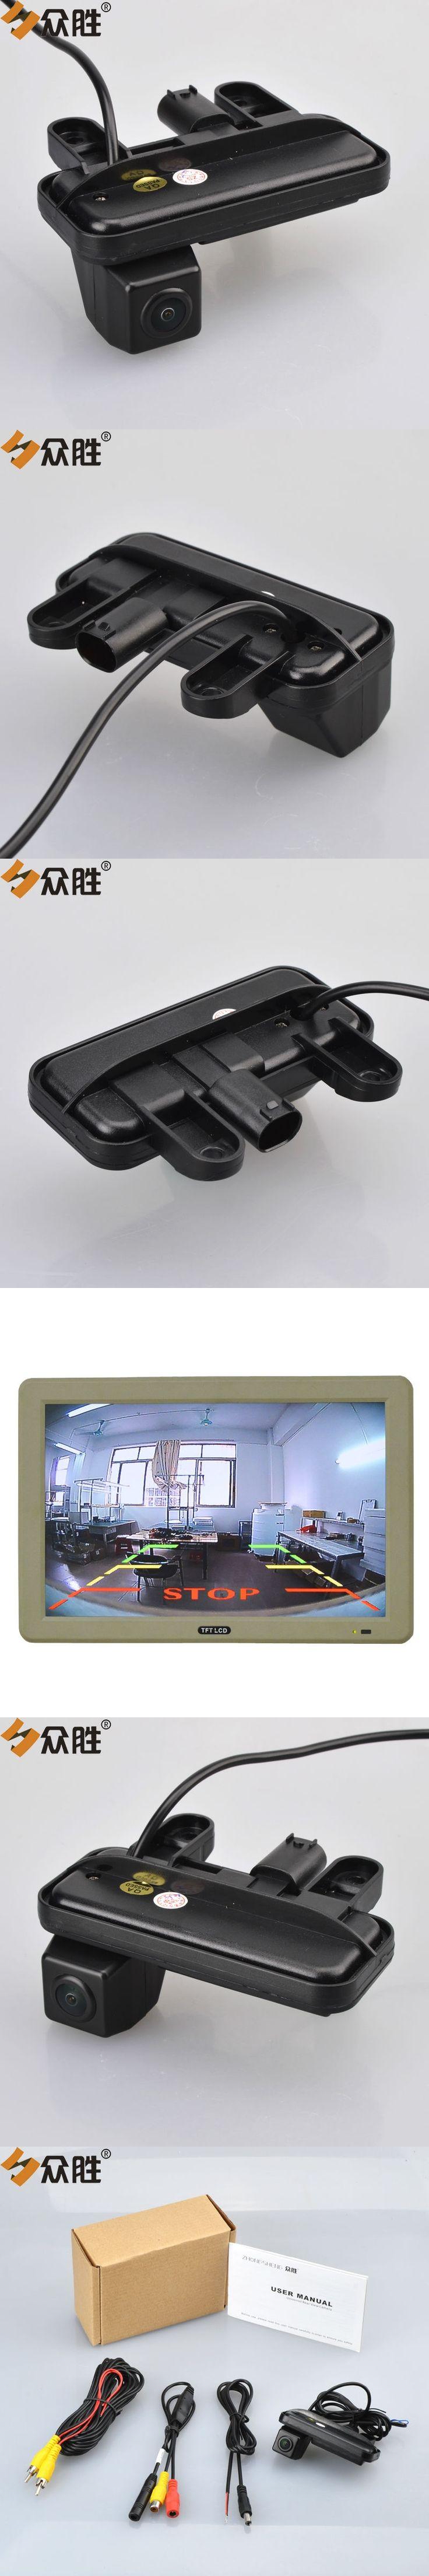 Car Rearview Camera for Mercedes Benz B180 B200 Car Trunk Handle Camera Auto Backup Reverse Parking Rear View Camera LS8008SMT